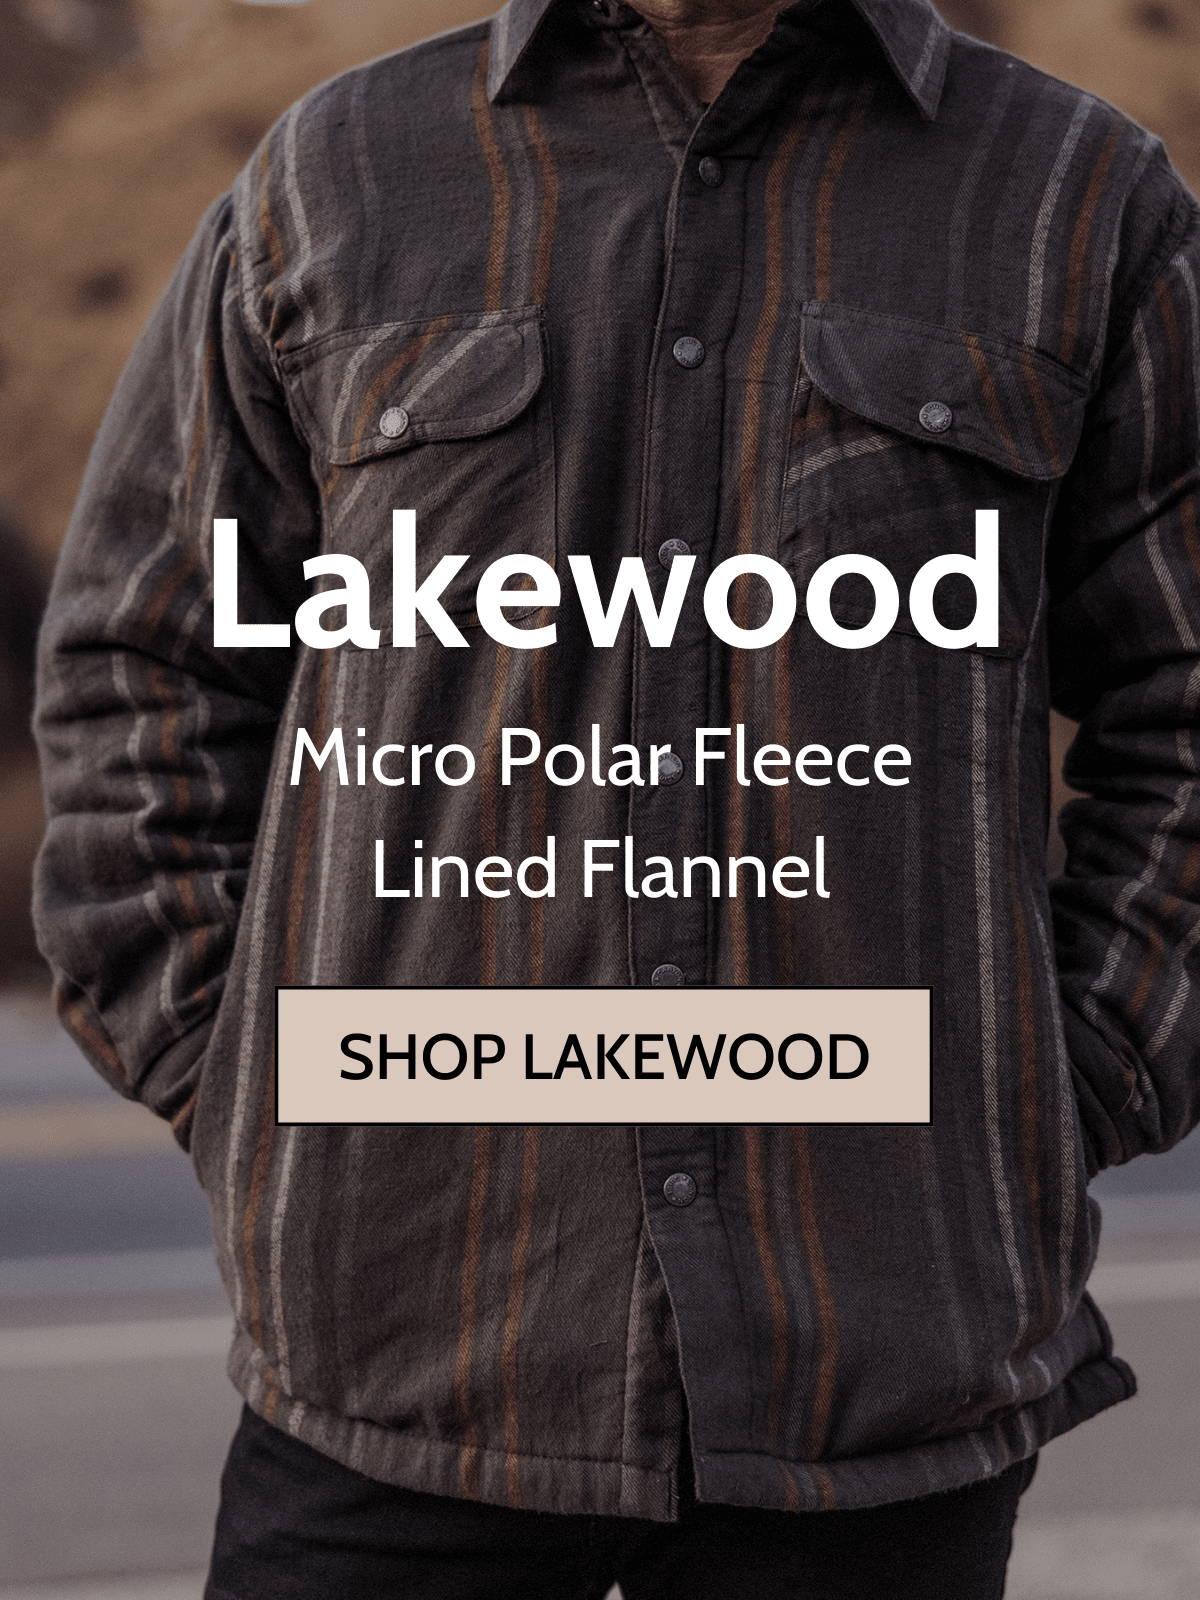 Canyon guide lake wood shirt jacket